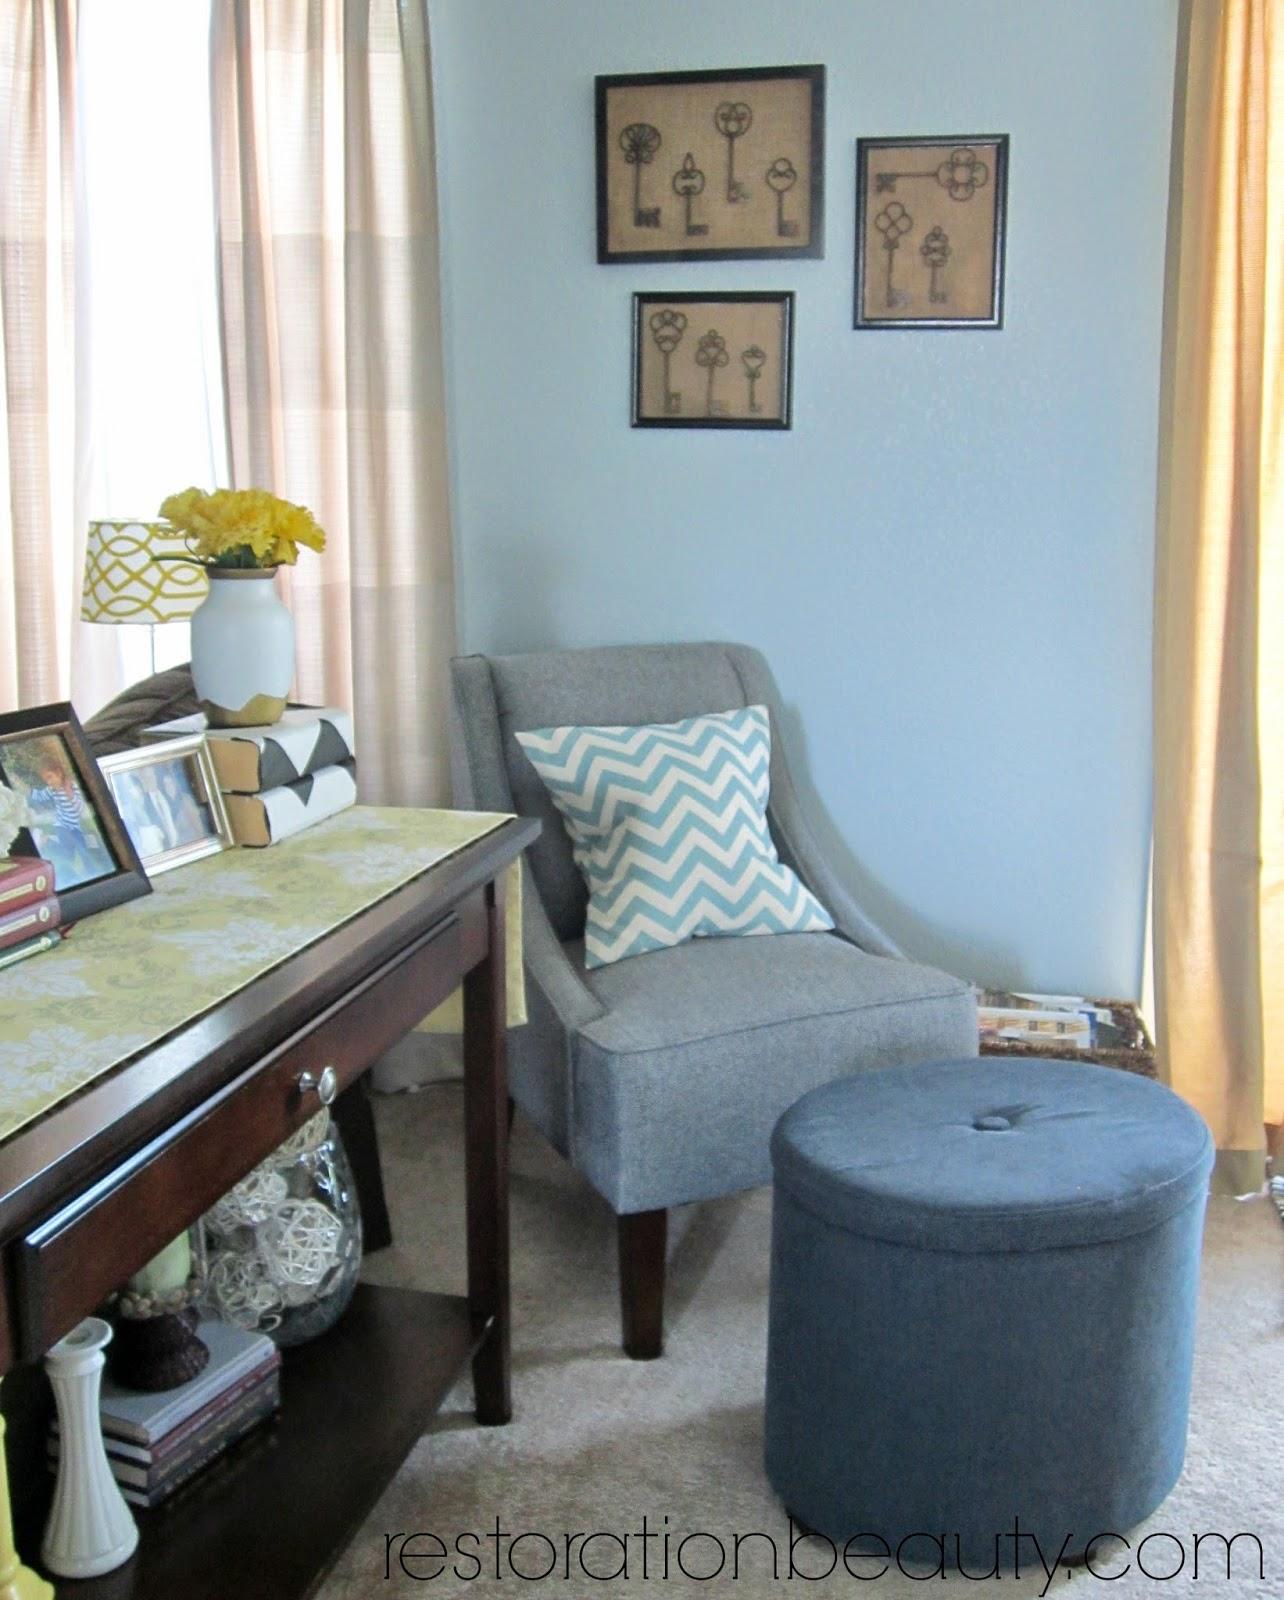 restoration beauty living room spring summer updates home tour